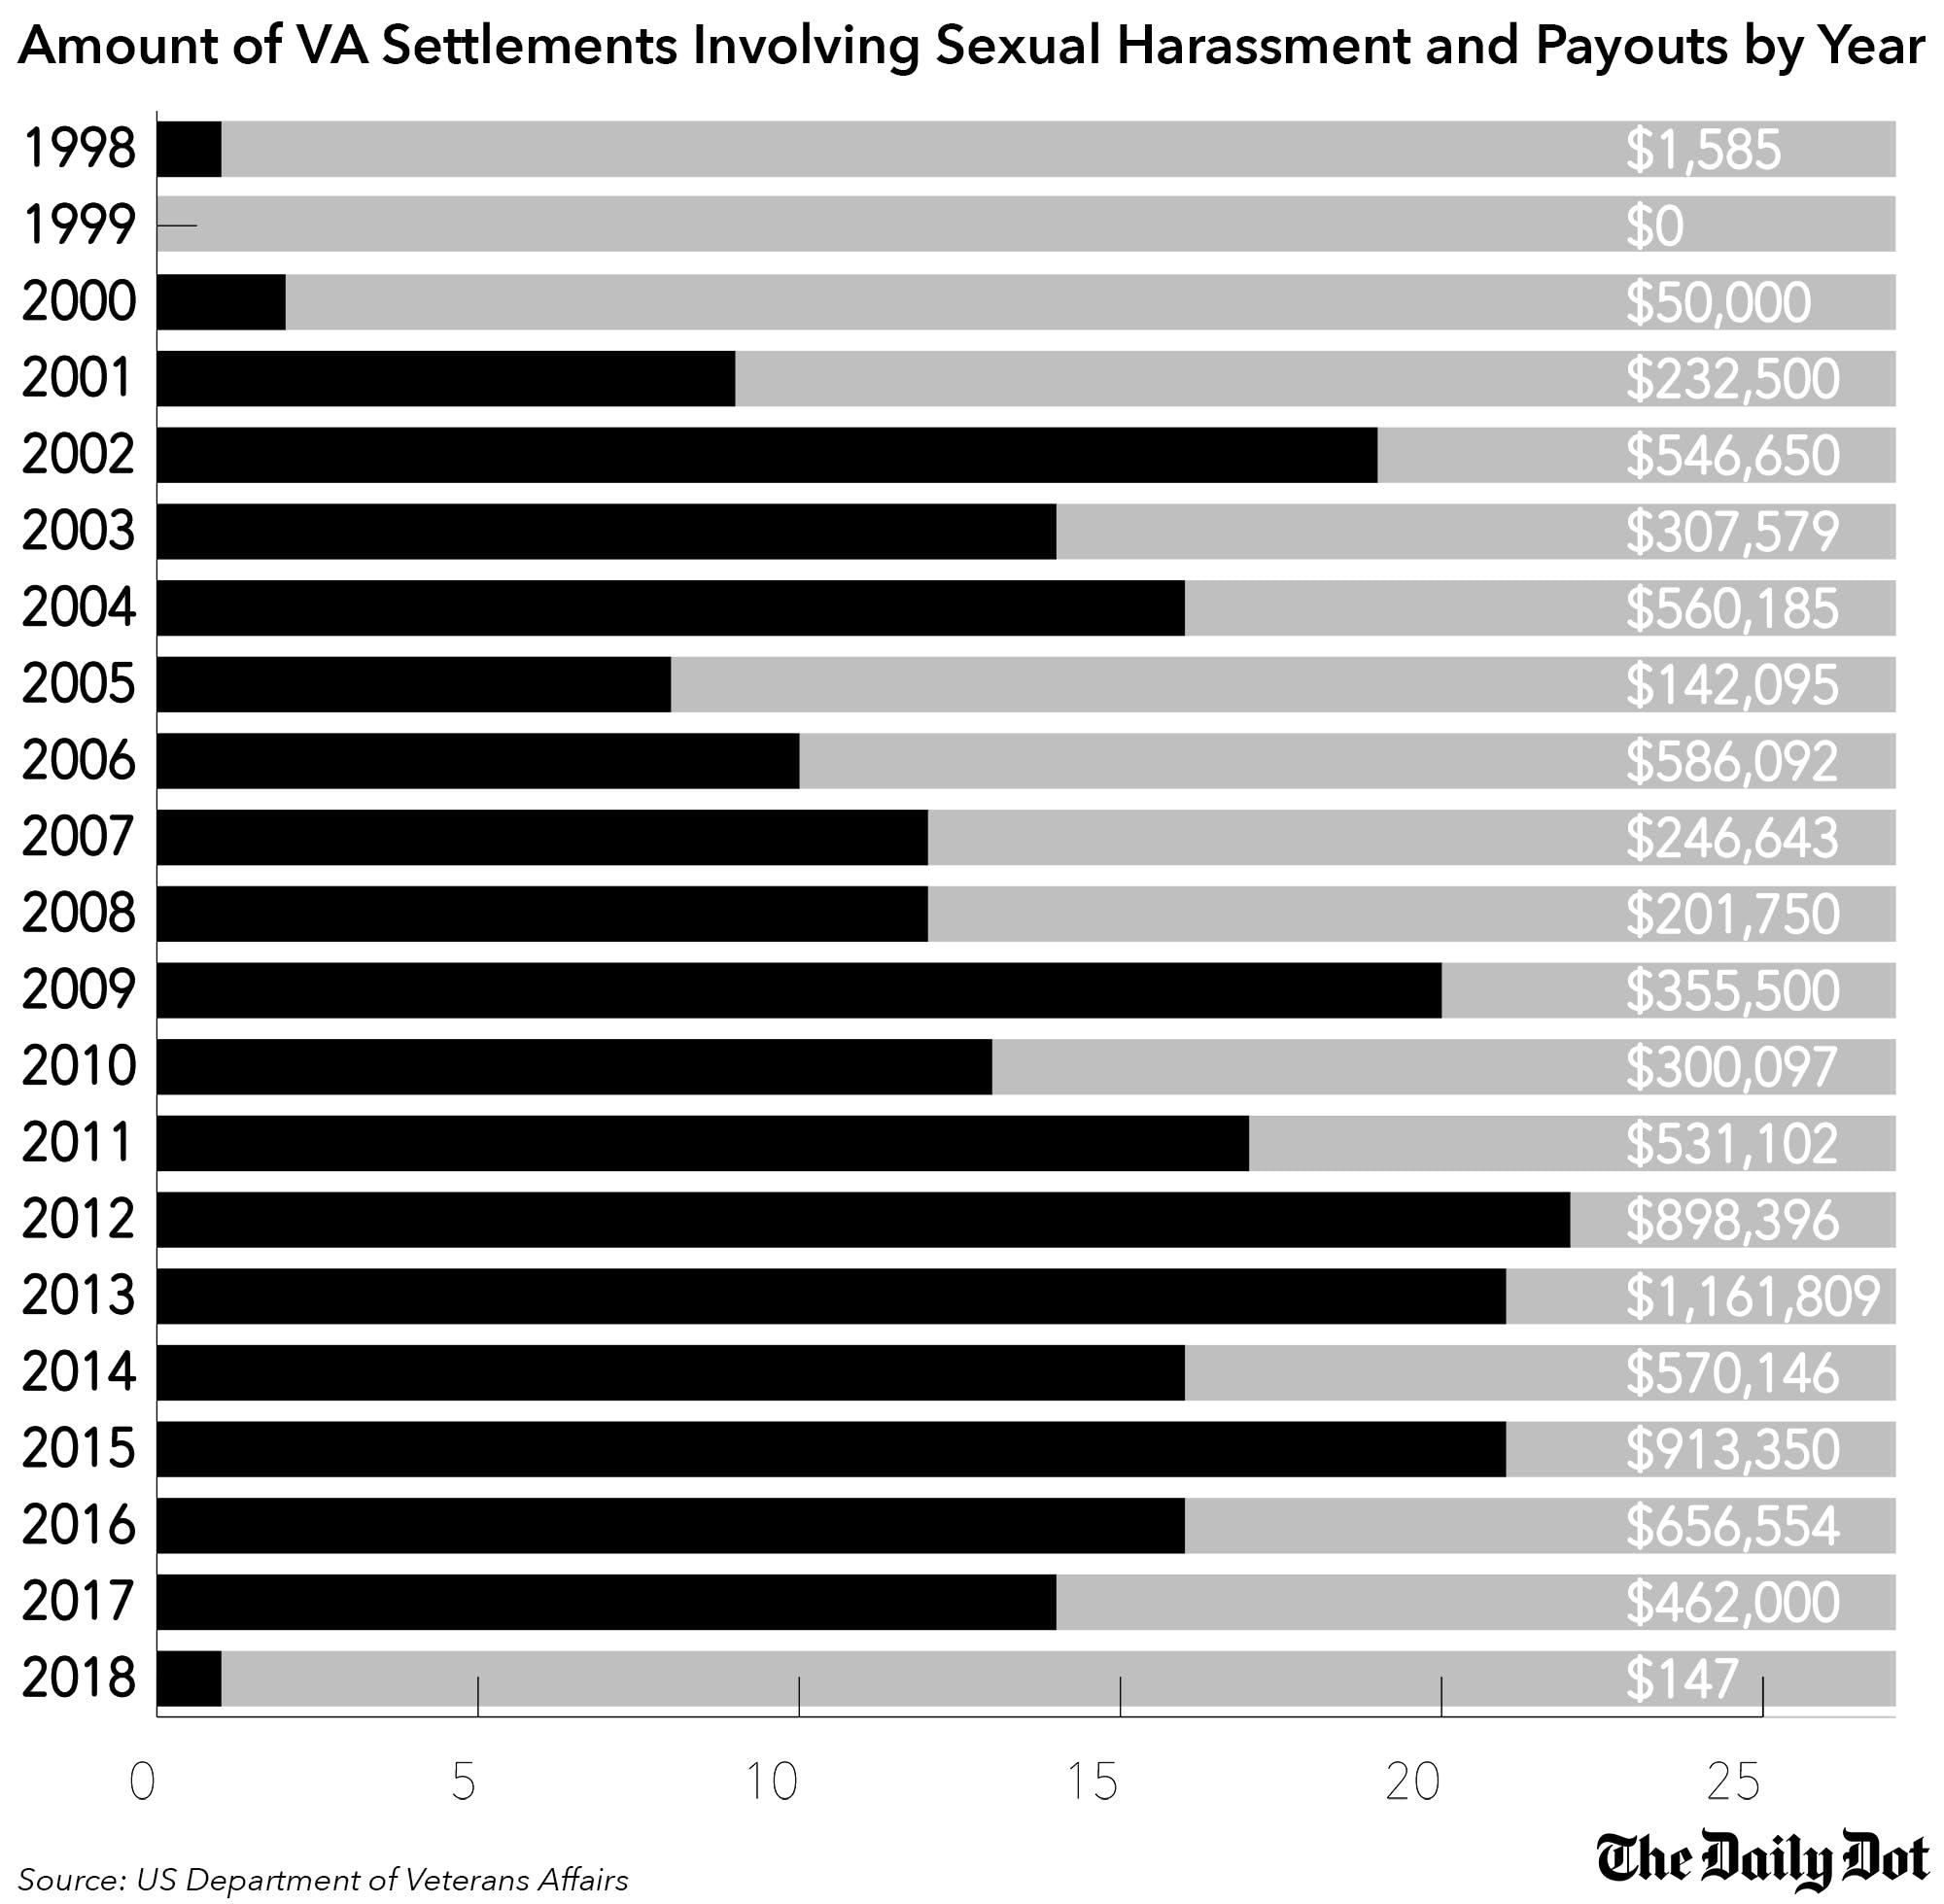 Veterans Affairs settlements involving sexual harassment